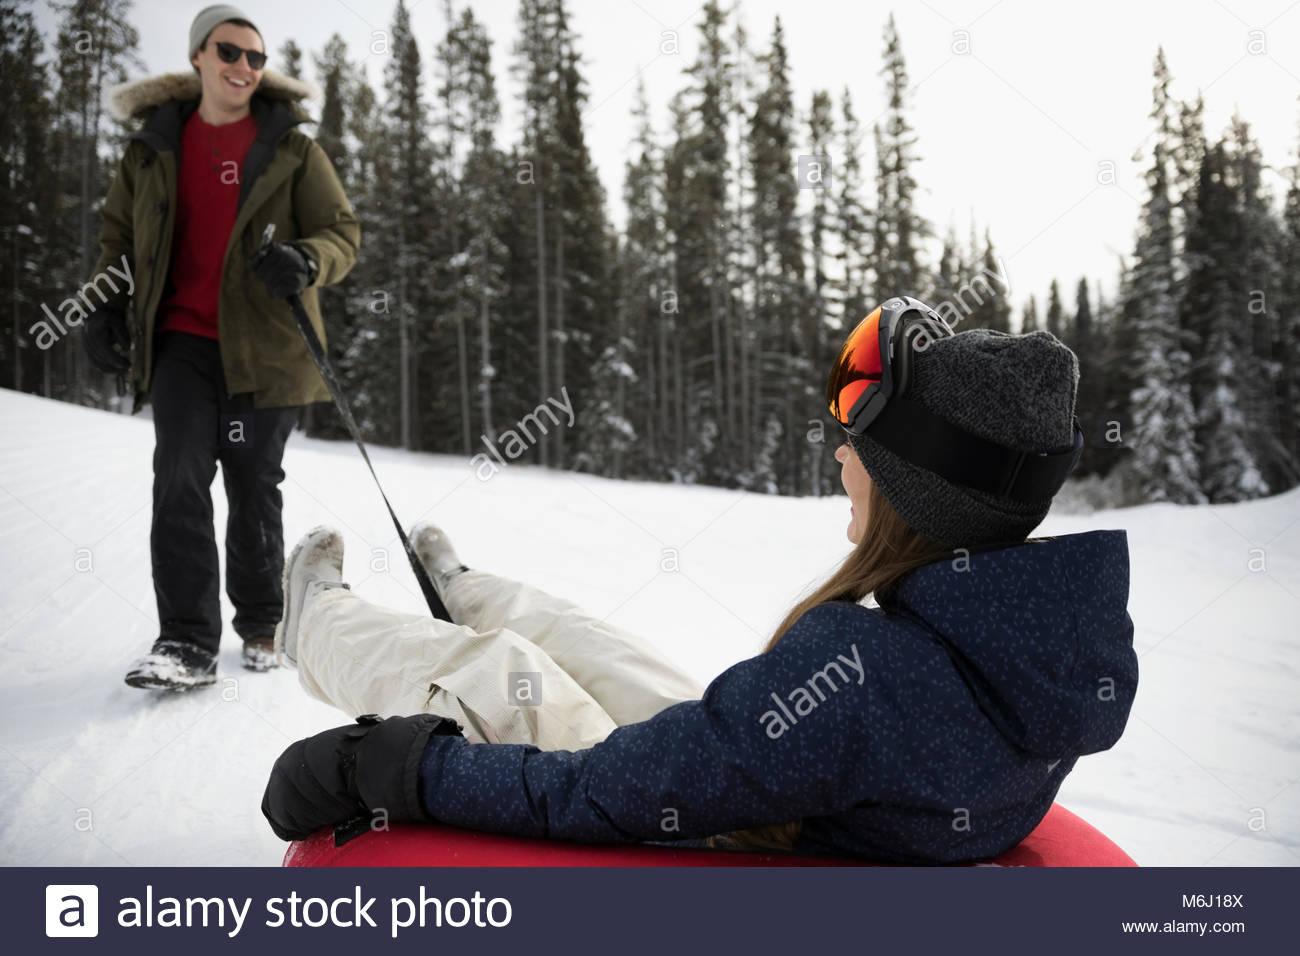 Novia Novio tirando en el tubo interior en la nieve Imagen De Stock